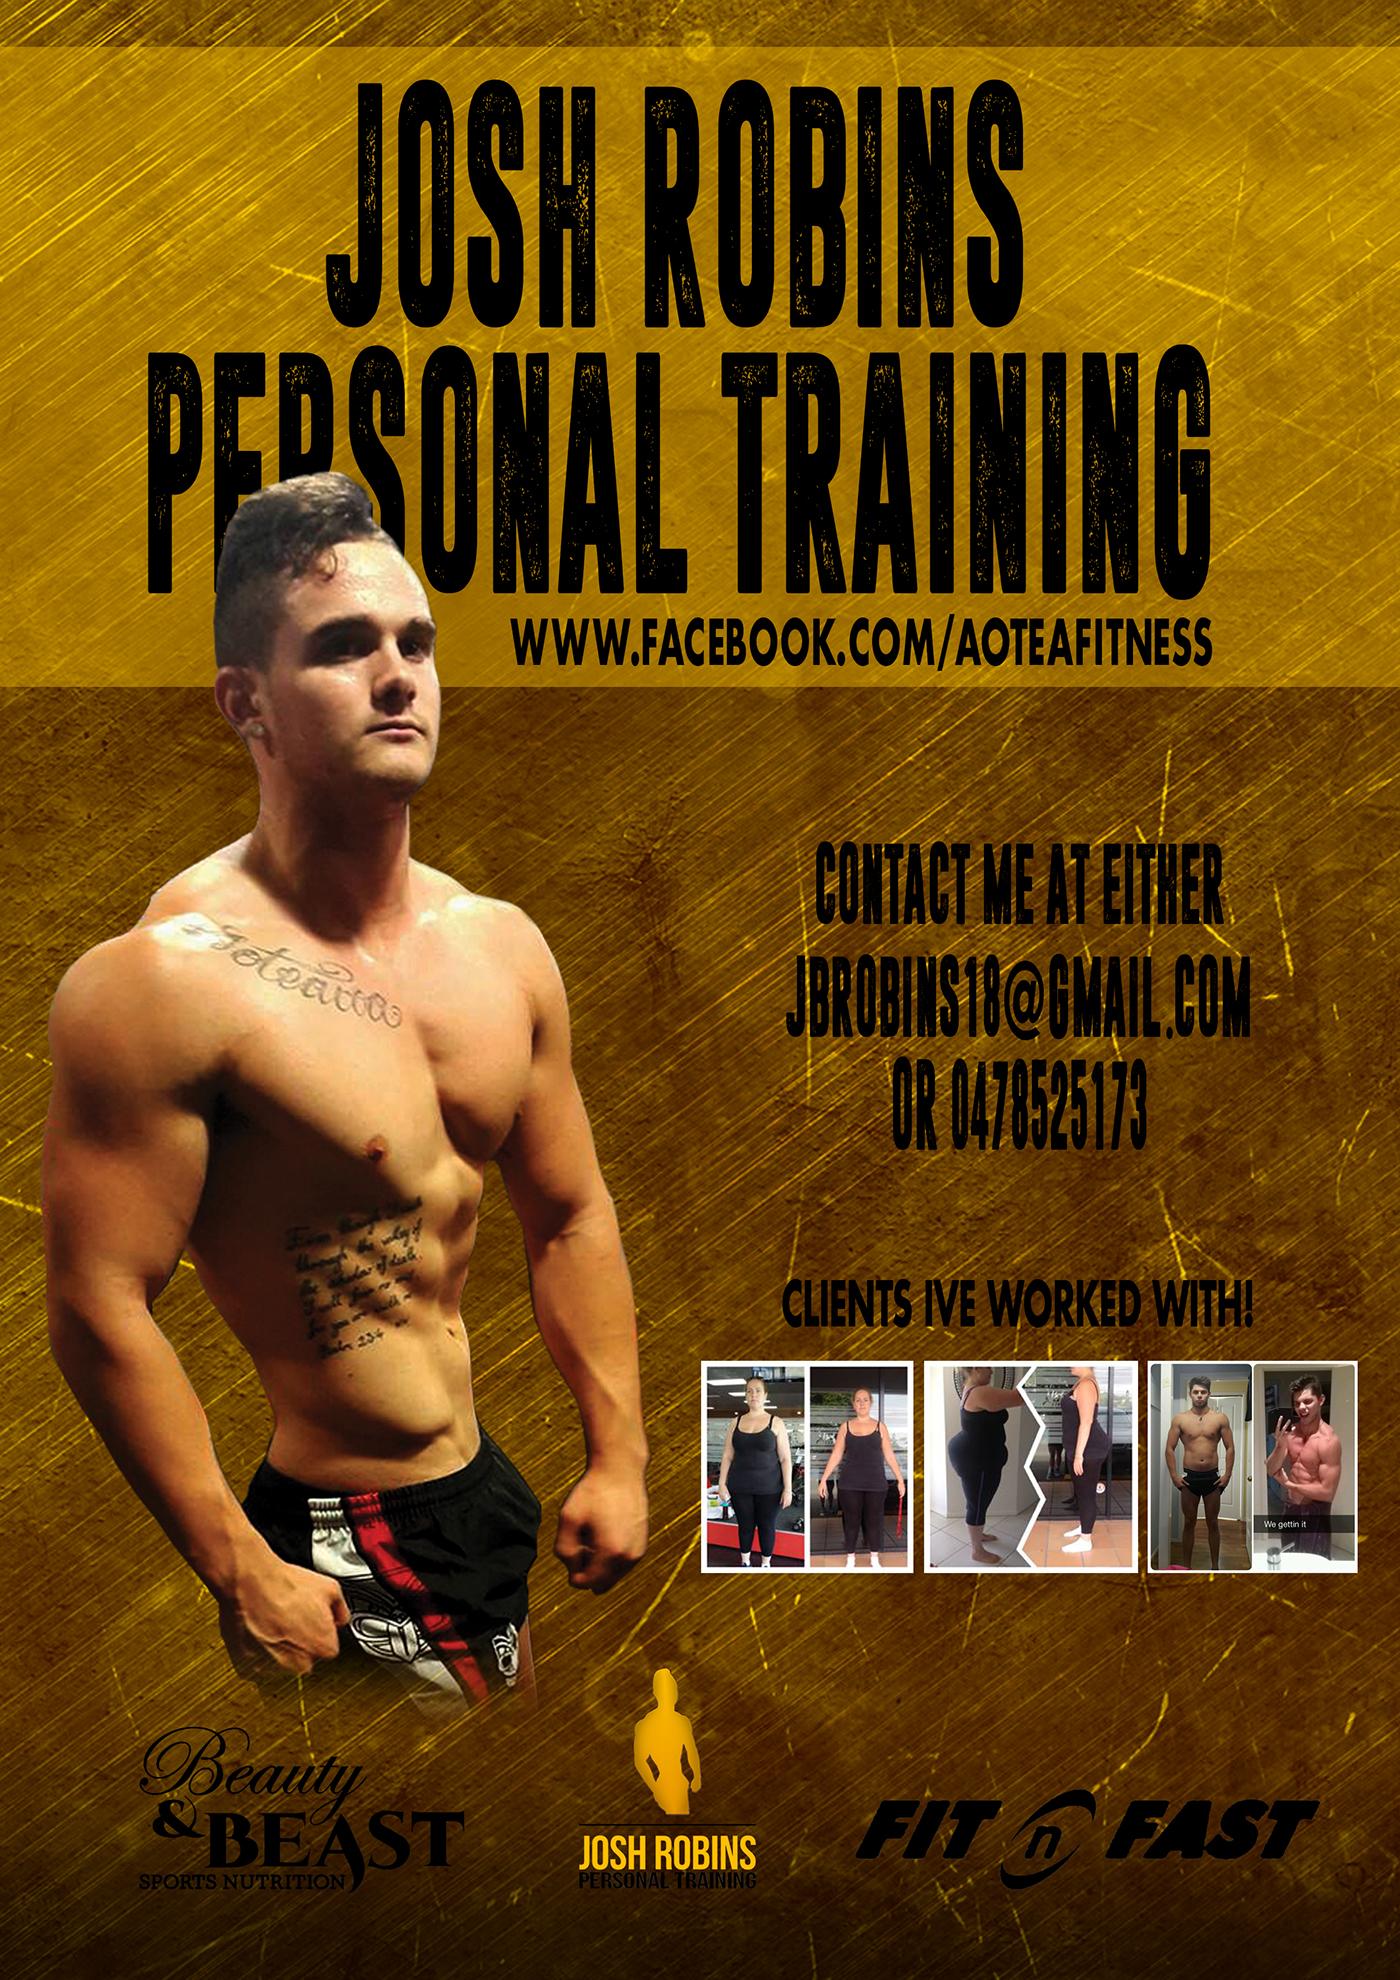 josh robins personal training advertising on behance